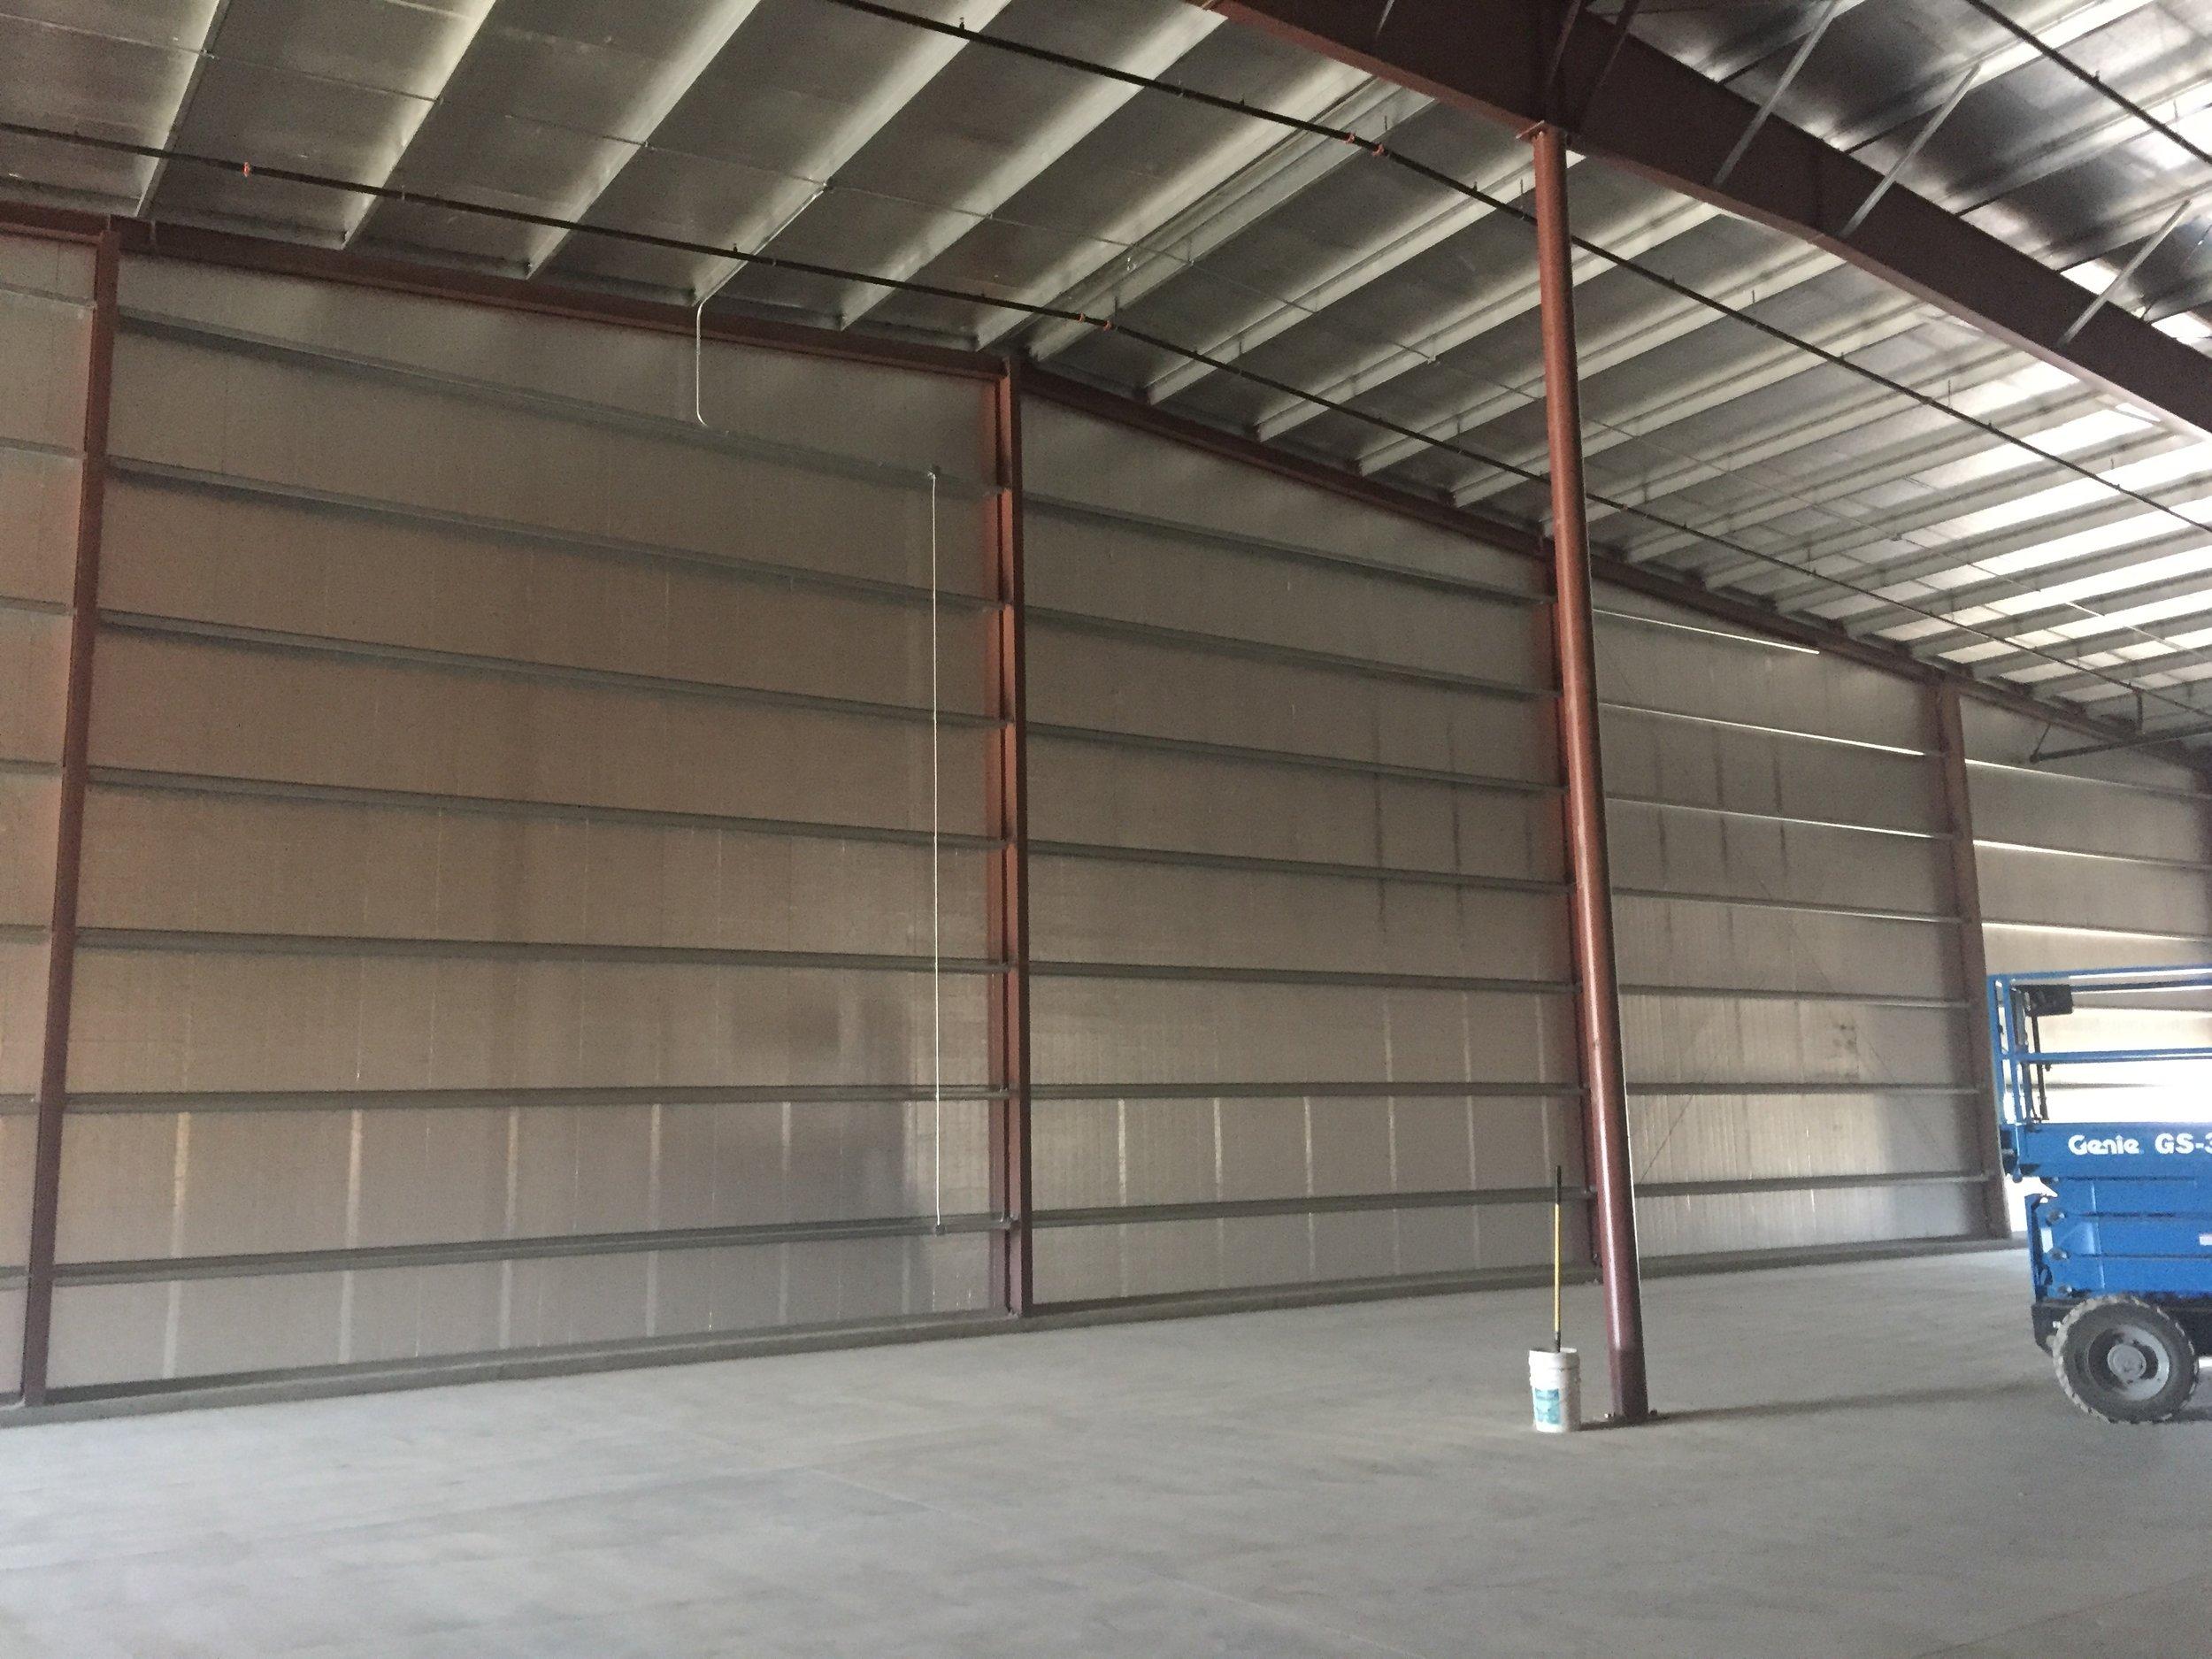 Hughson Nut, Inc. Storage and Processing Facility Image